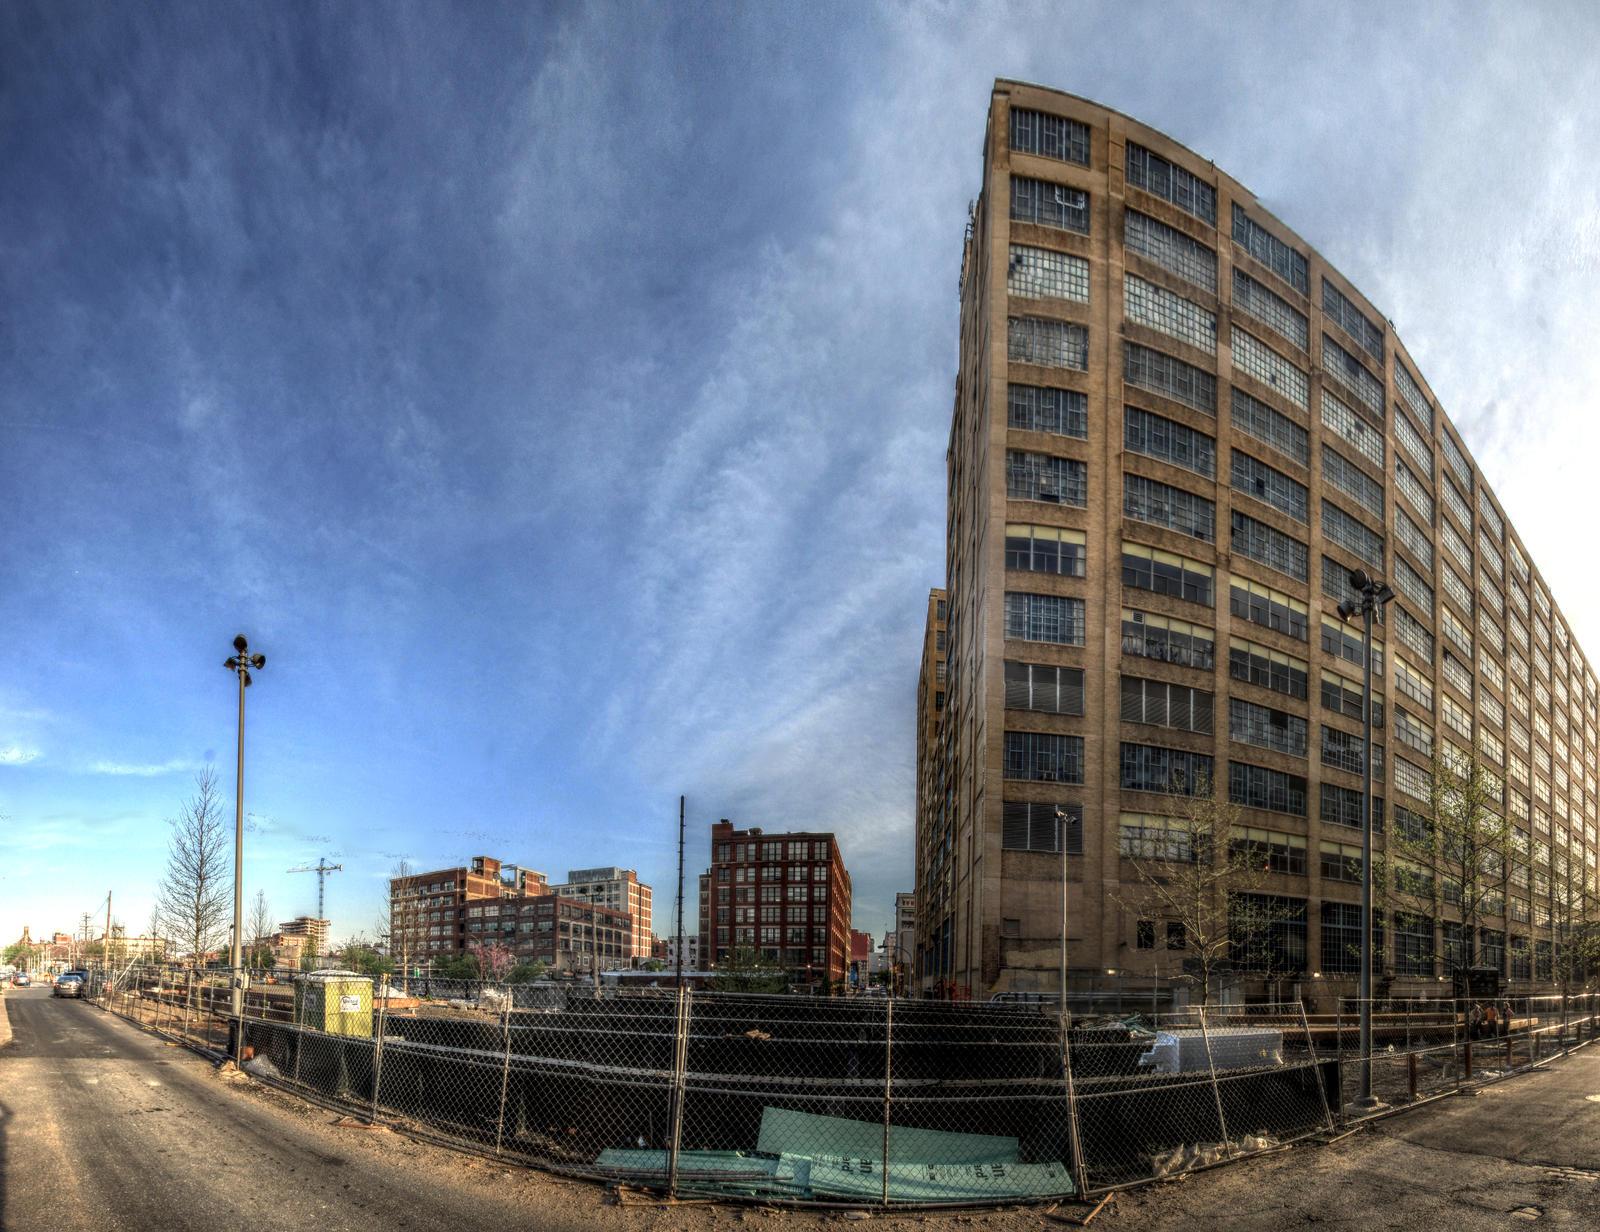 Panorama 3632 hdr pregamma 1 mantiuk06 contrast ma